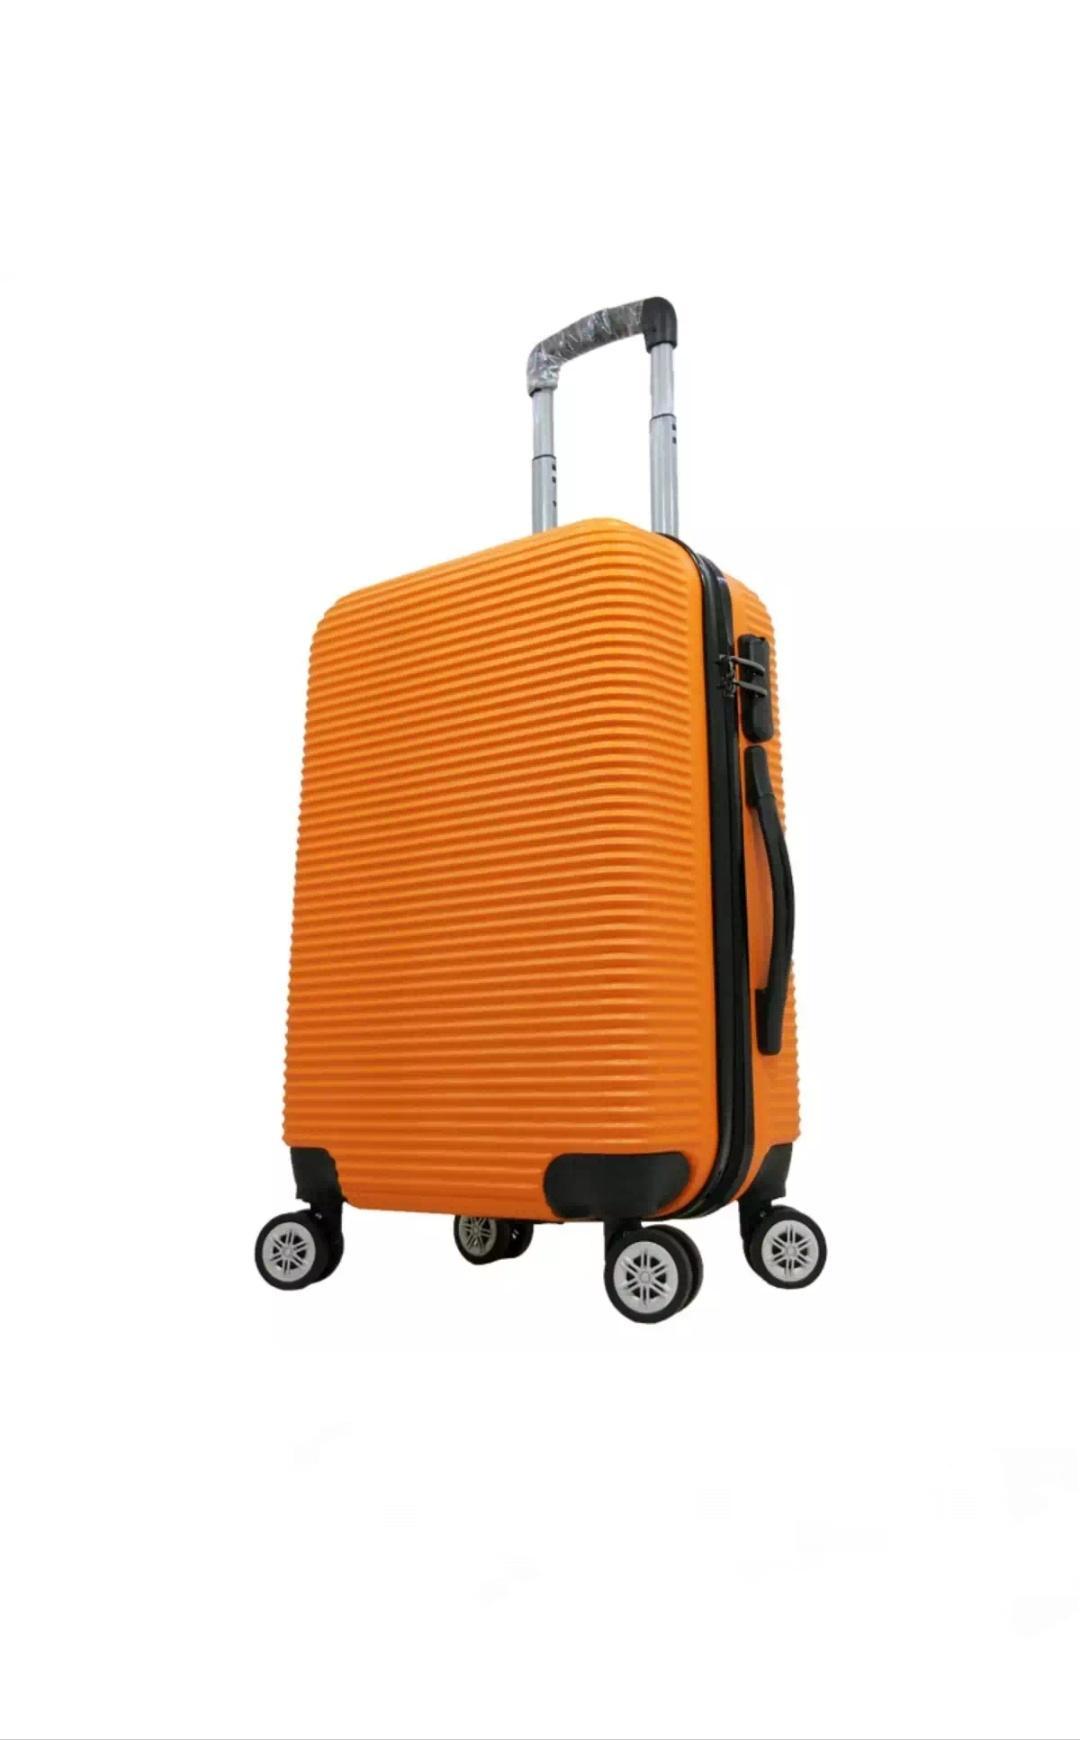 Fitur Koper Polo Love Fiber Hardchase 20inch Waterproof Original Tas Hoby Abs Kabin Size 20 Inch 705 Silver Detail Gambar Orange Terbaru